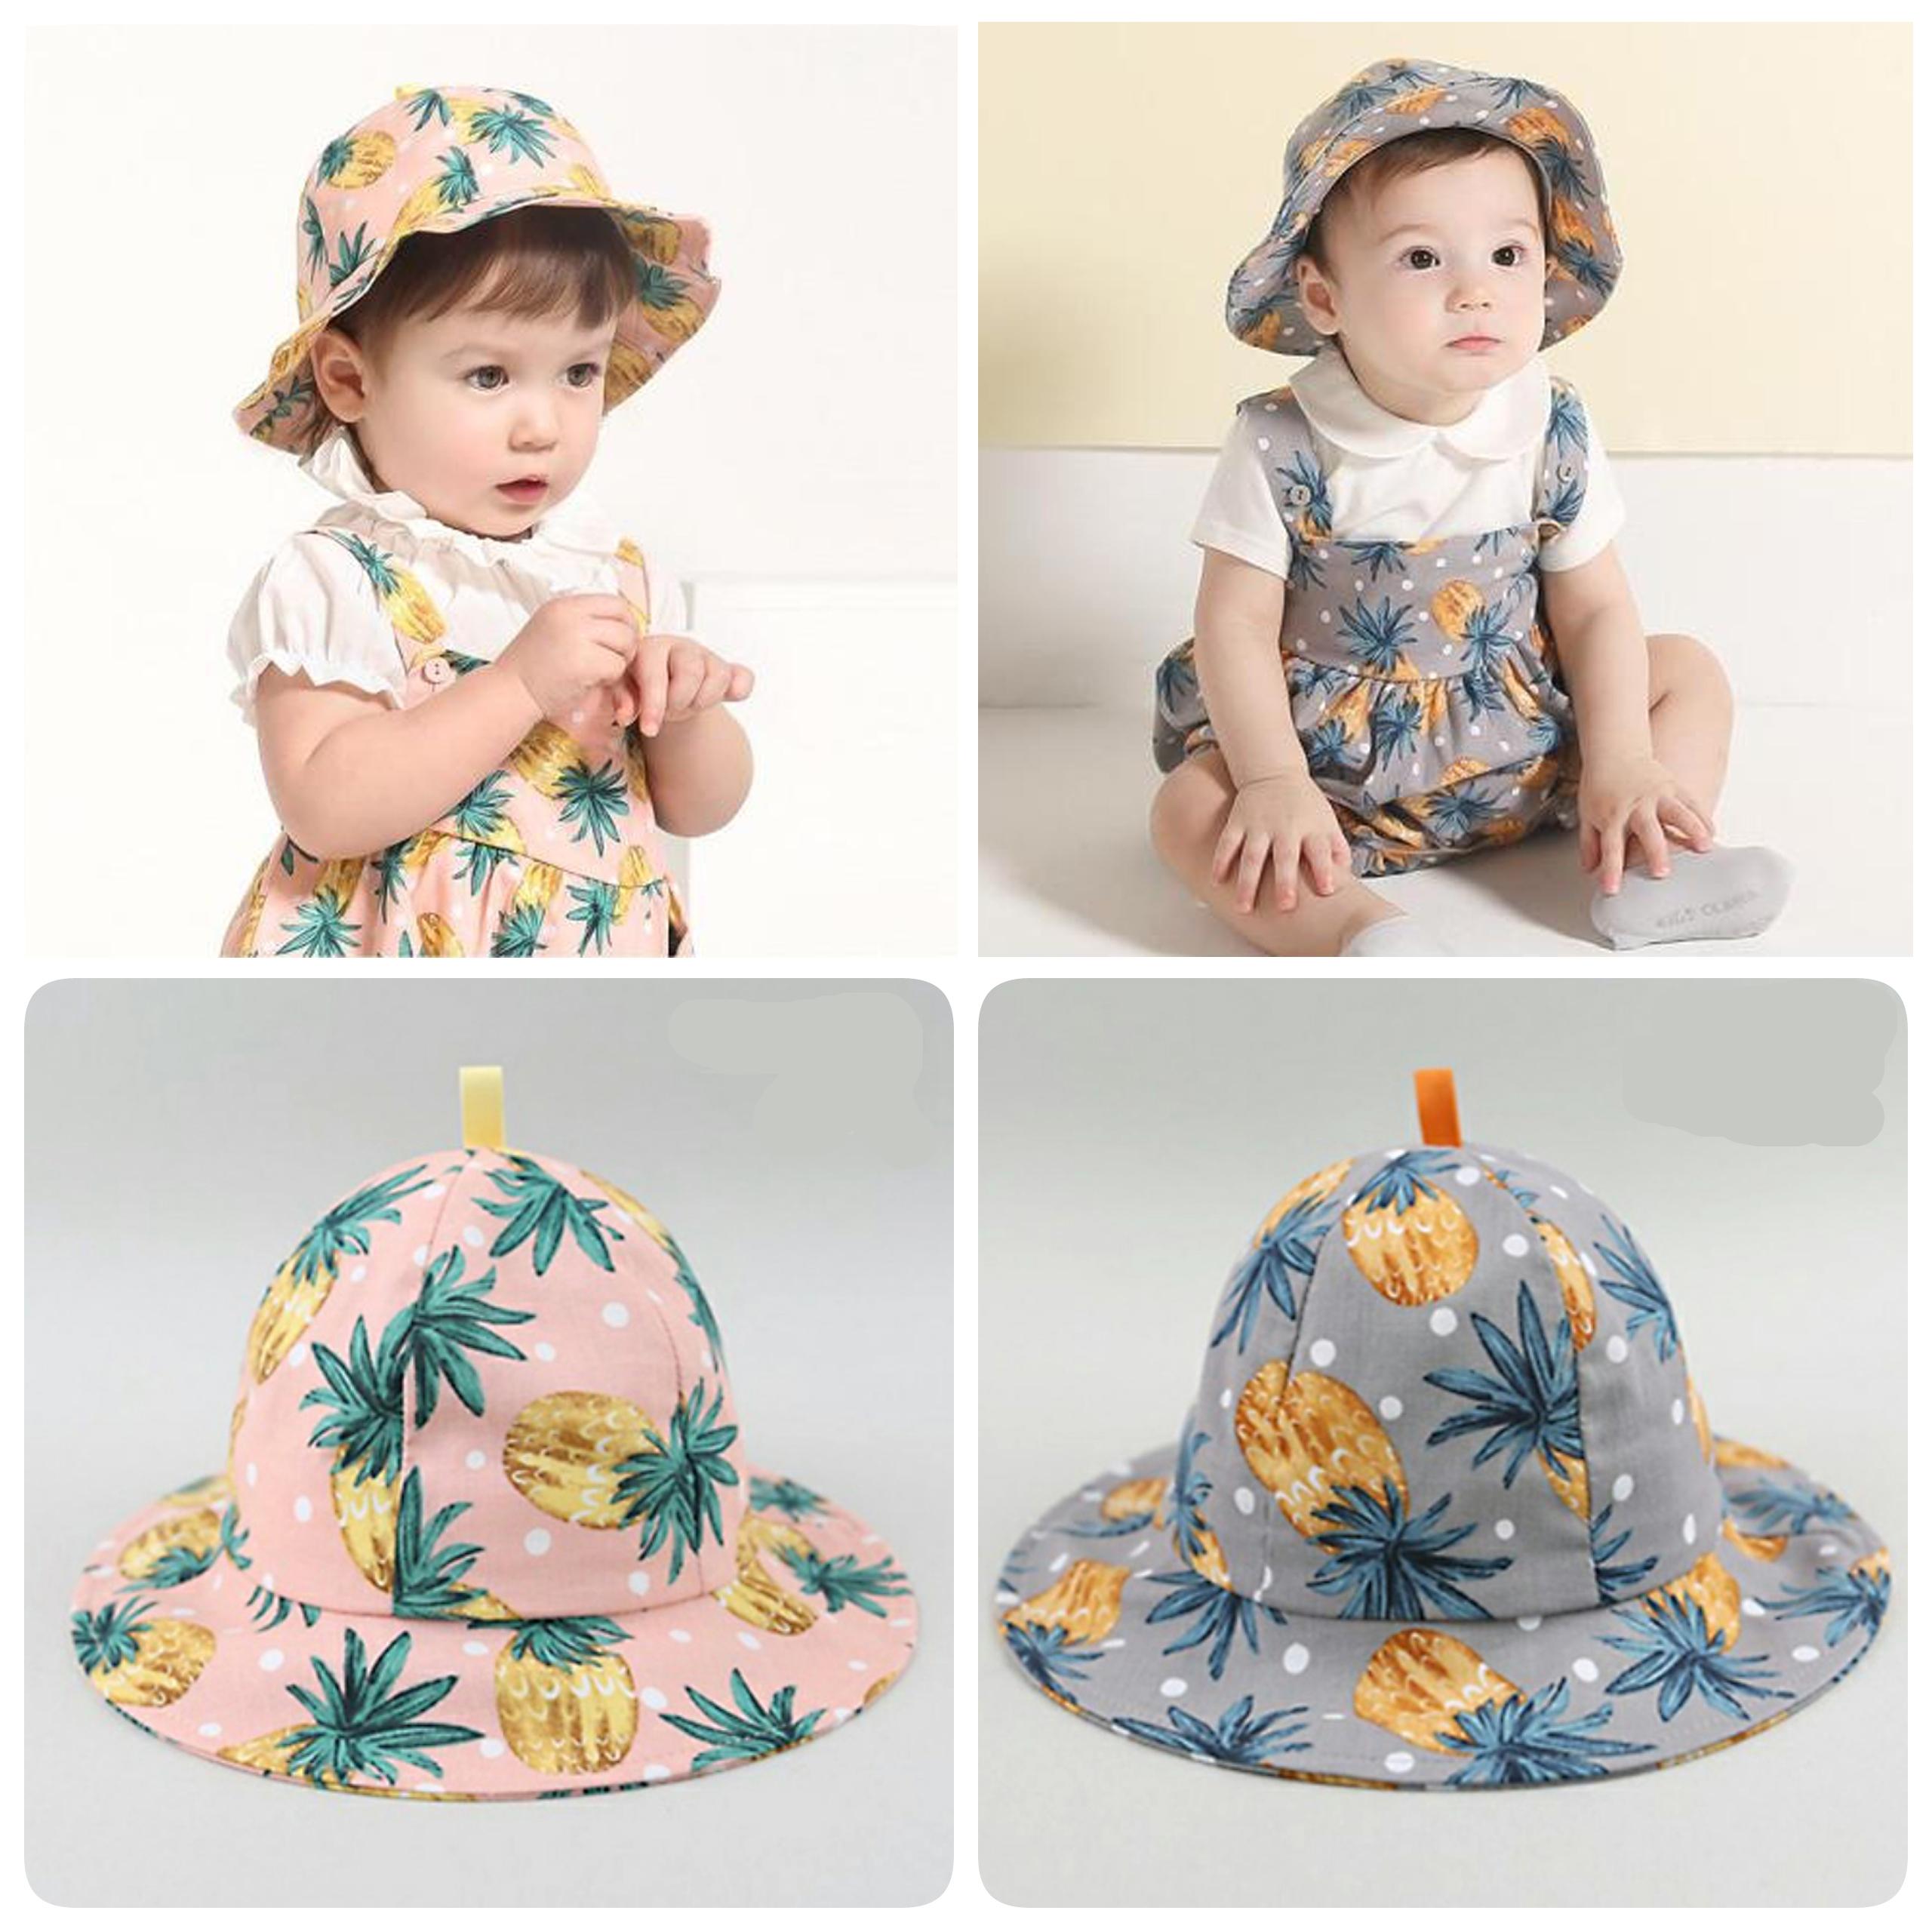 Baby Touch หมวกปีกรอบ ลายสับปะรด (Hat - DH)